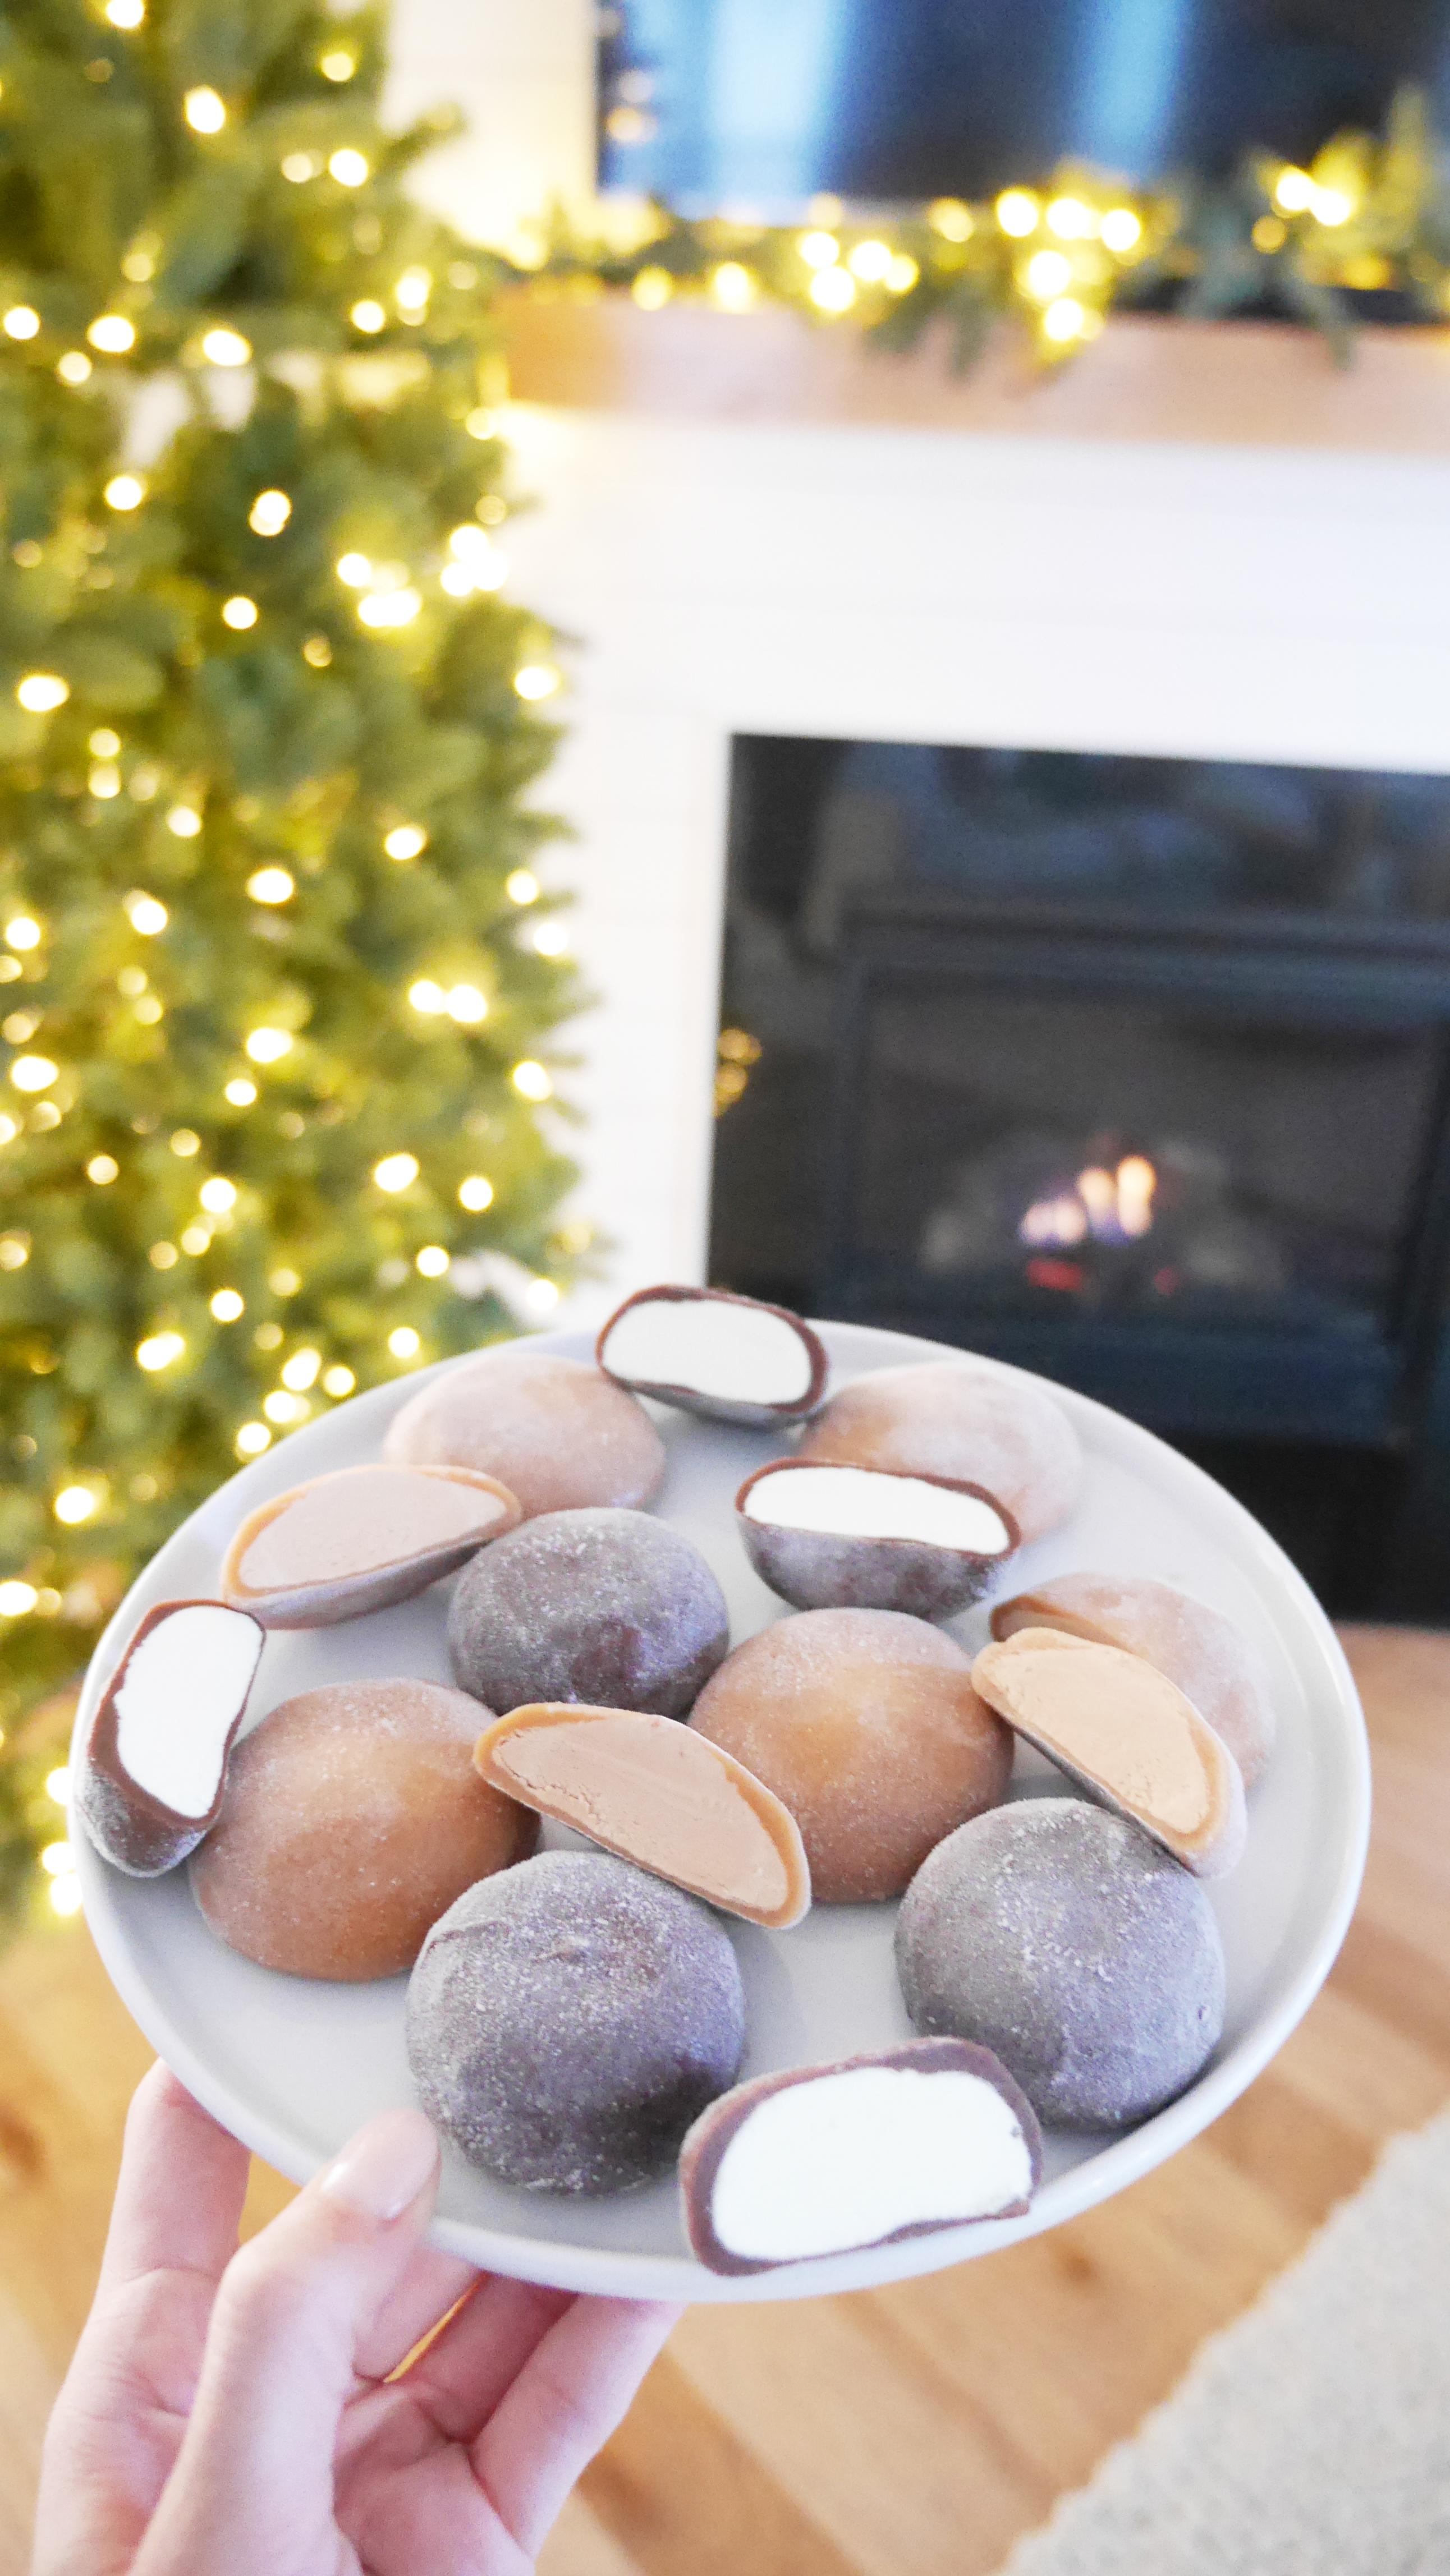 Bubbies Seasonal Holiday Mochi Ice Cream